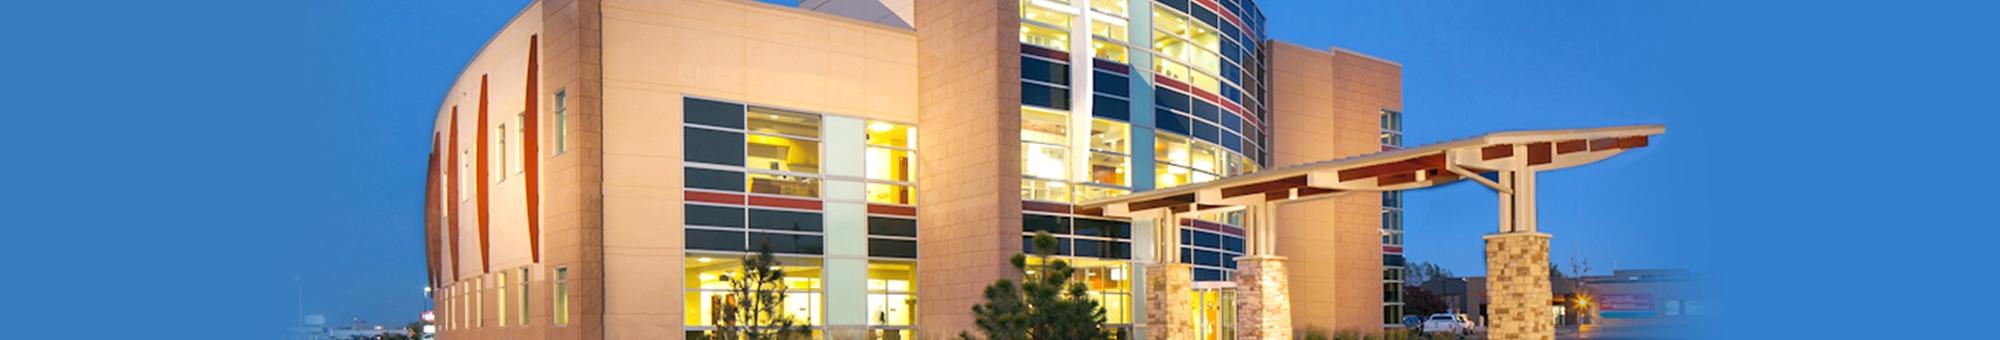 Sub location Williston Clinic